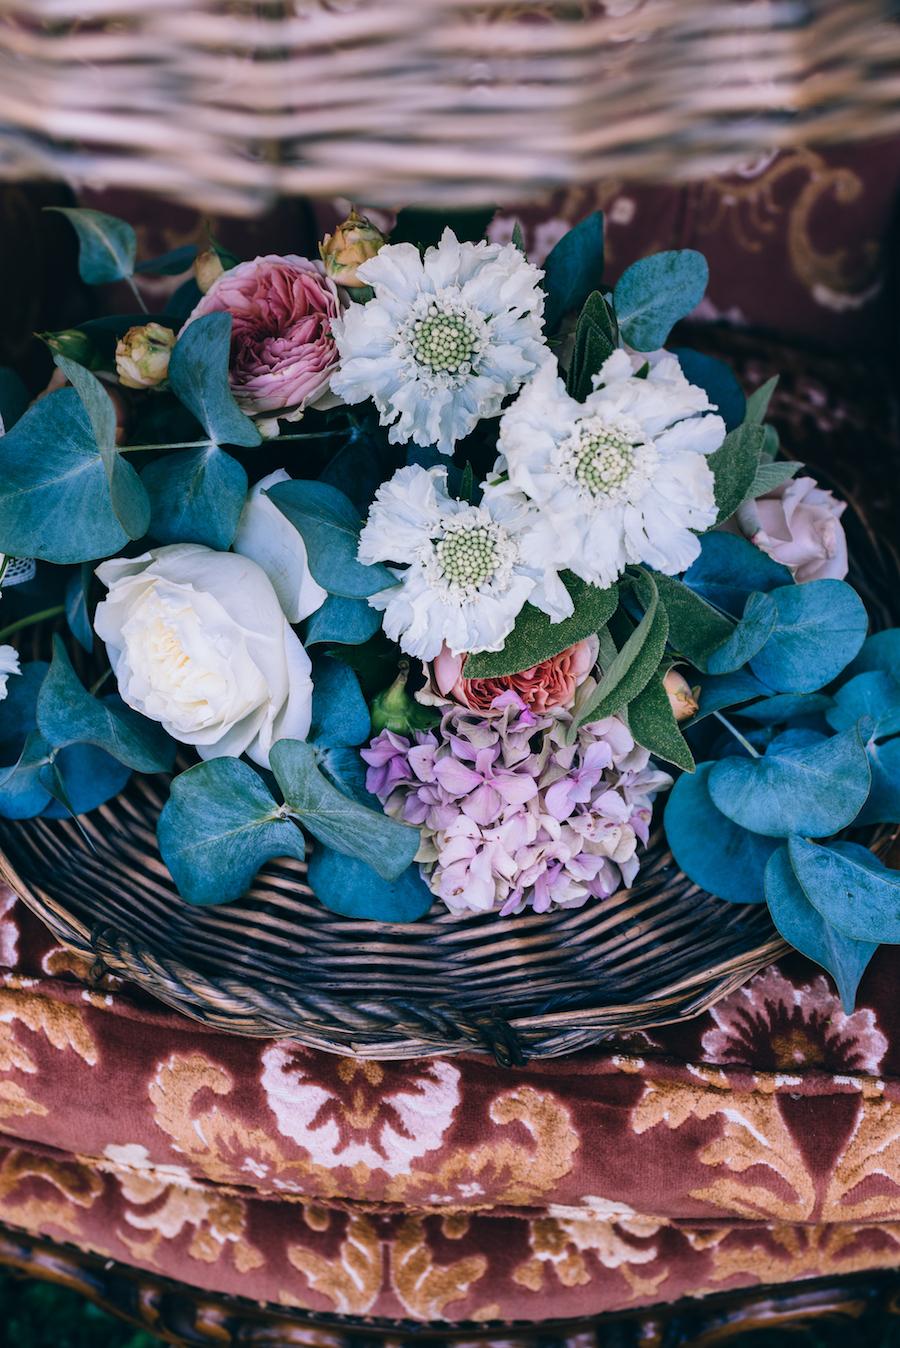 composizione floreale boho chic